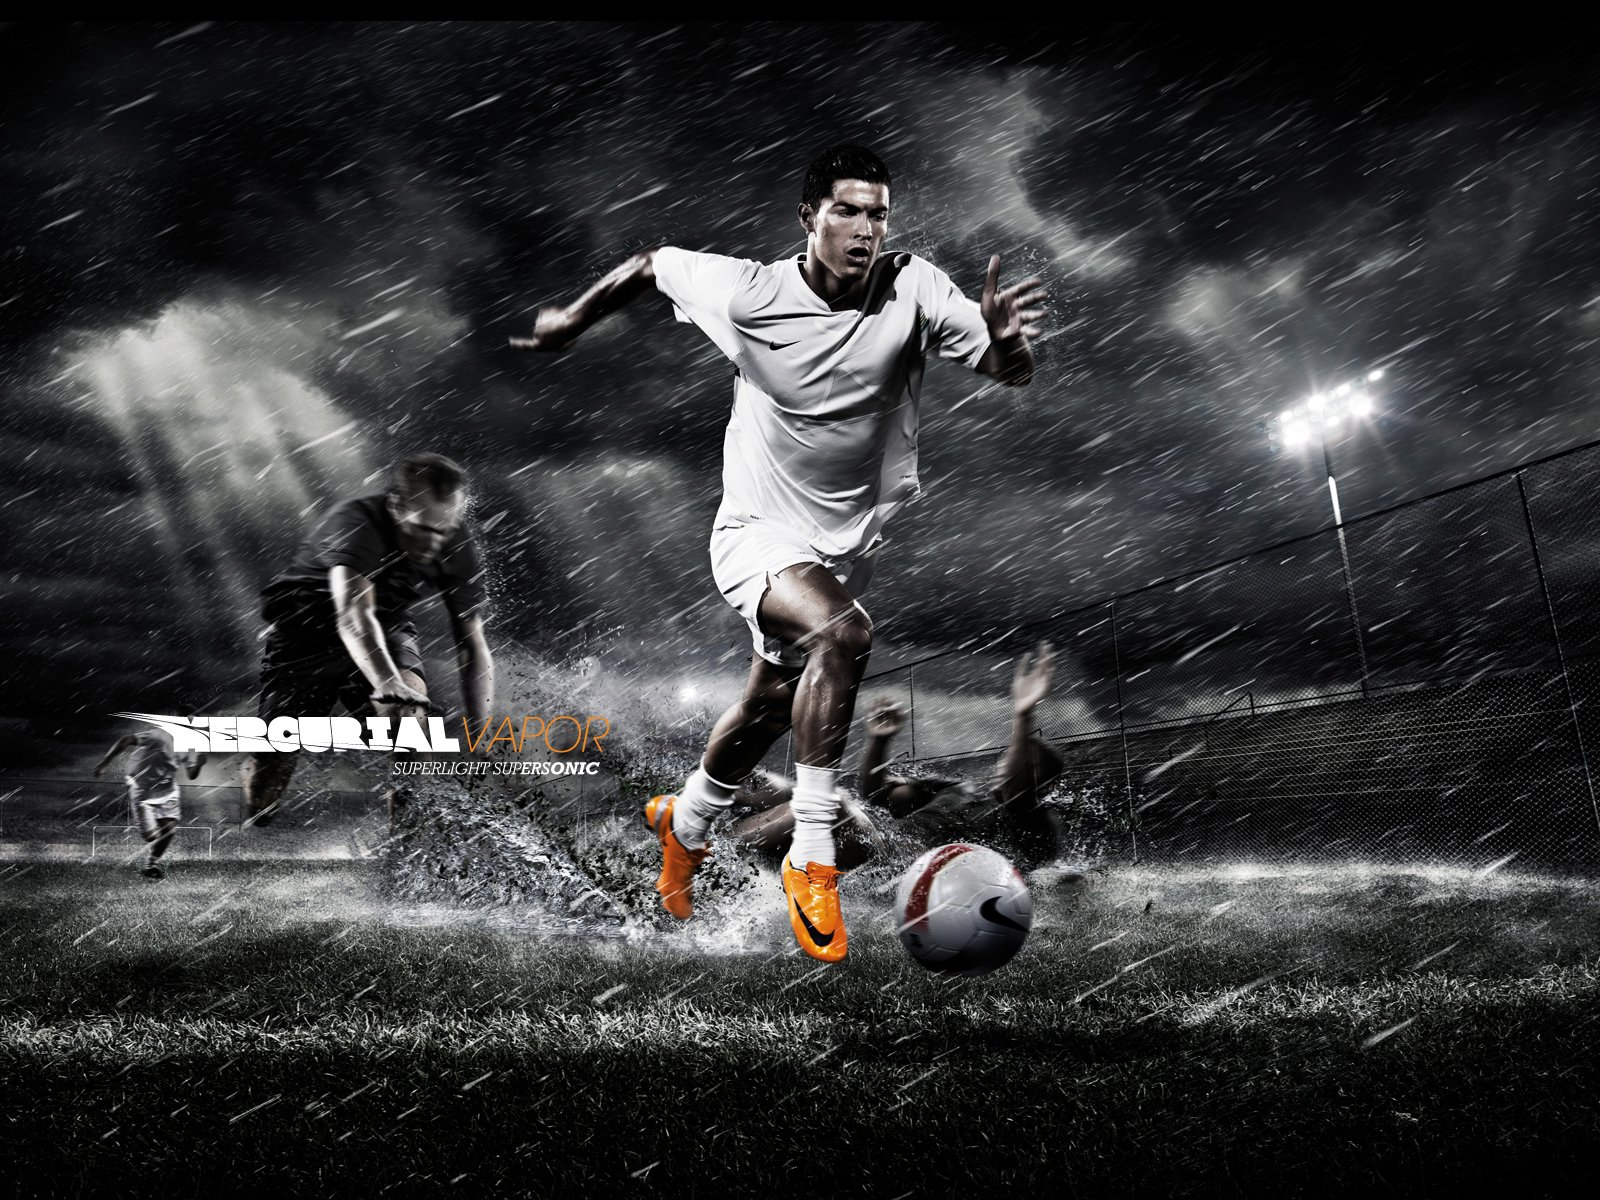 Nike Football Wallpaper Hd   Football Wallpaper HD Football 1600x1200